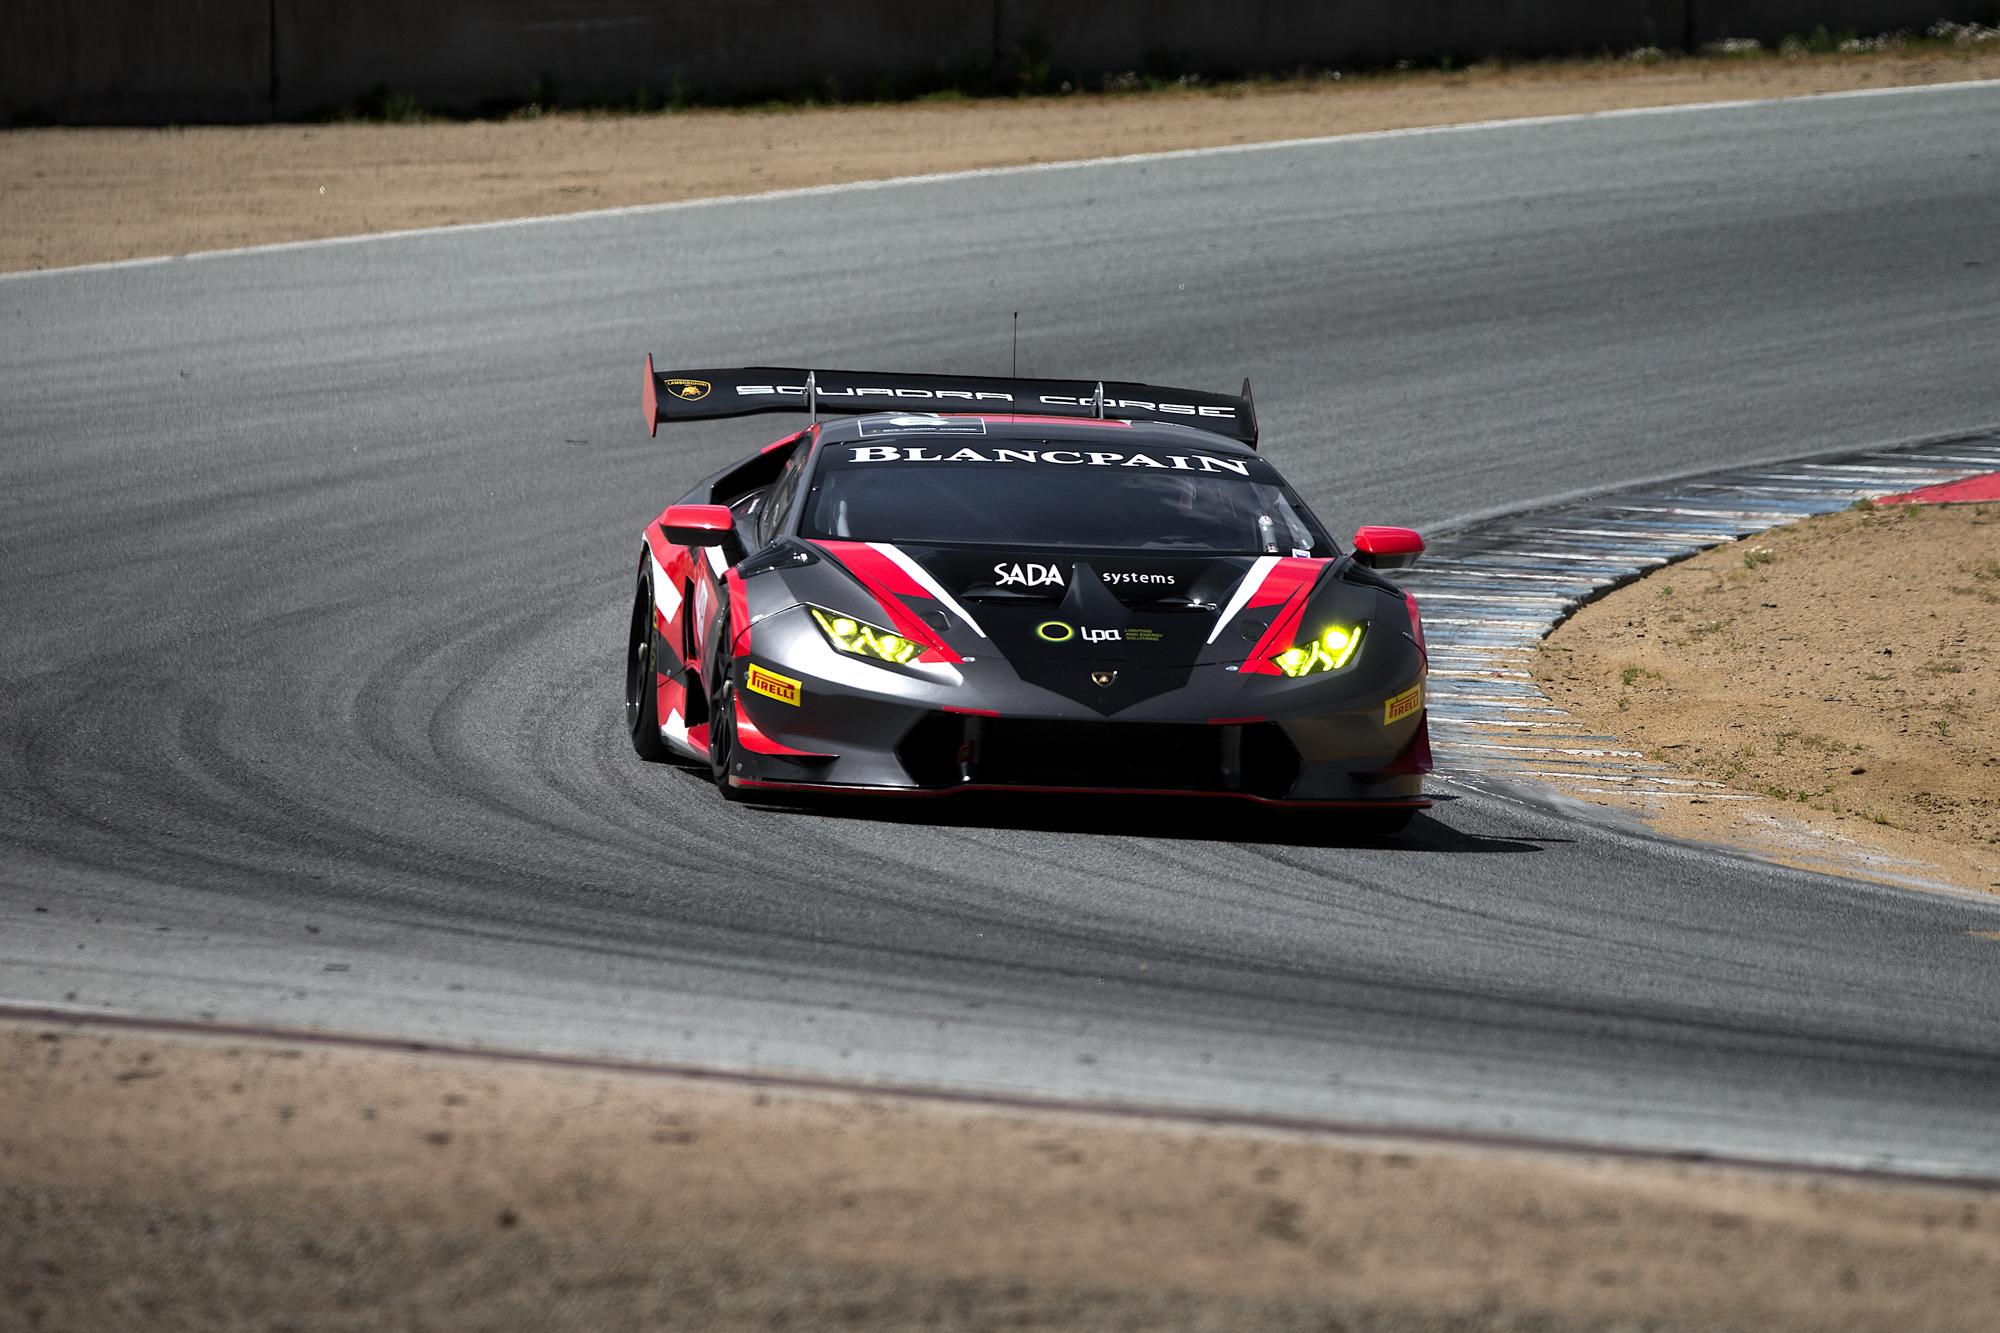 Steven-Racing-Laguna-20180531-96261.jpg